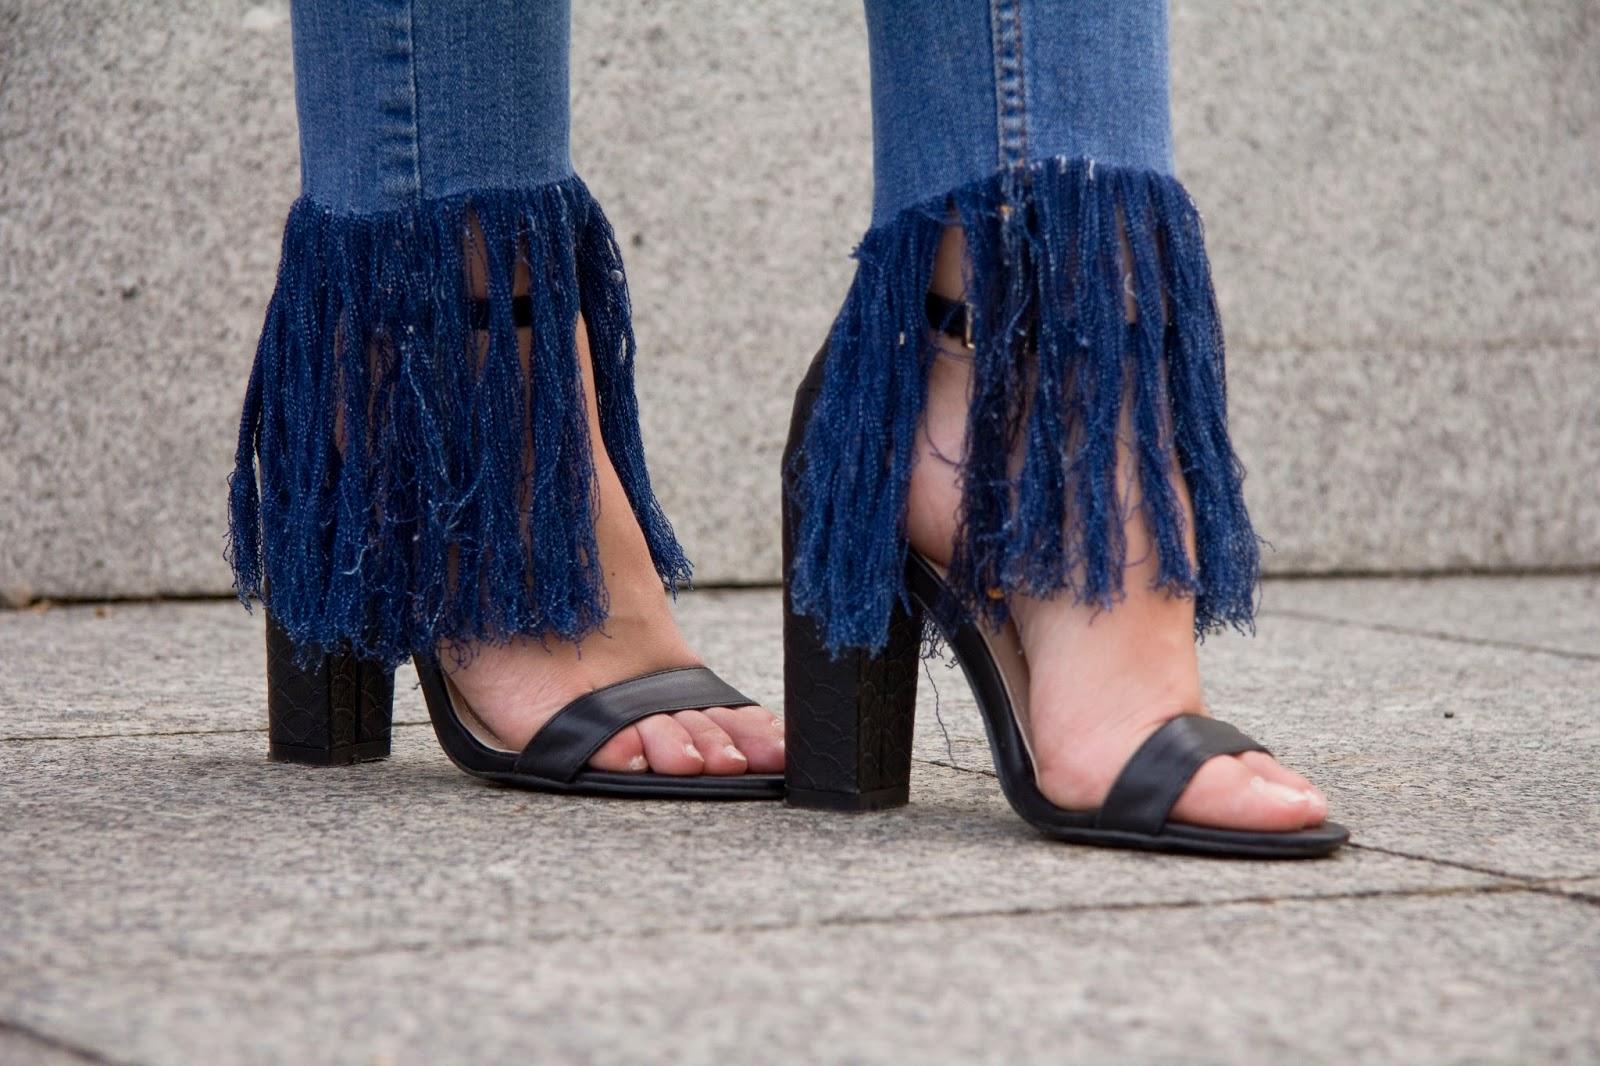 modne dżinsy lato 2016